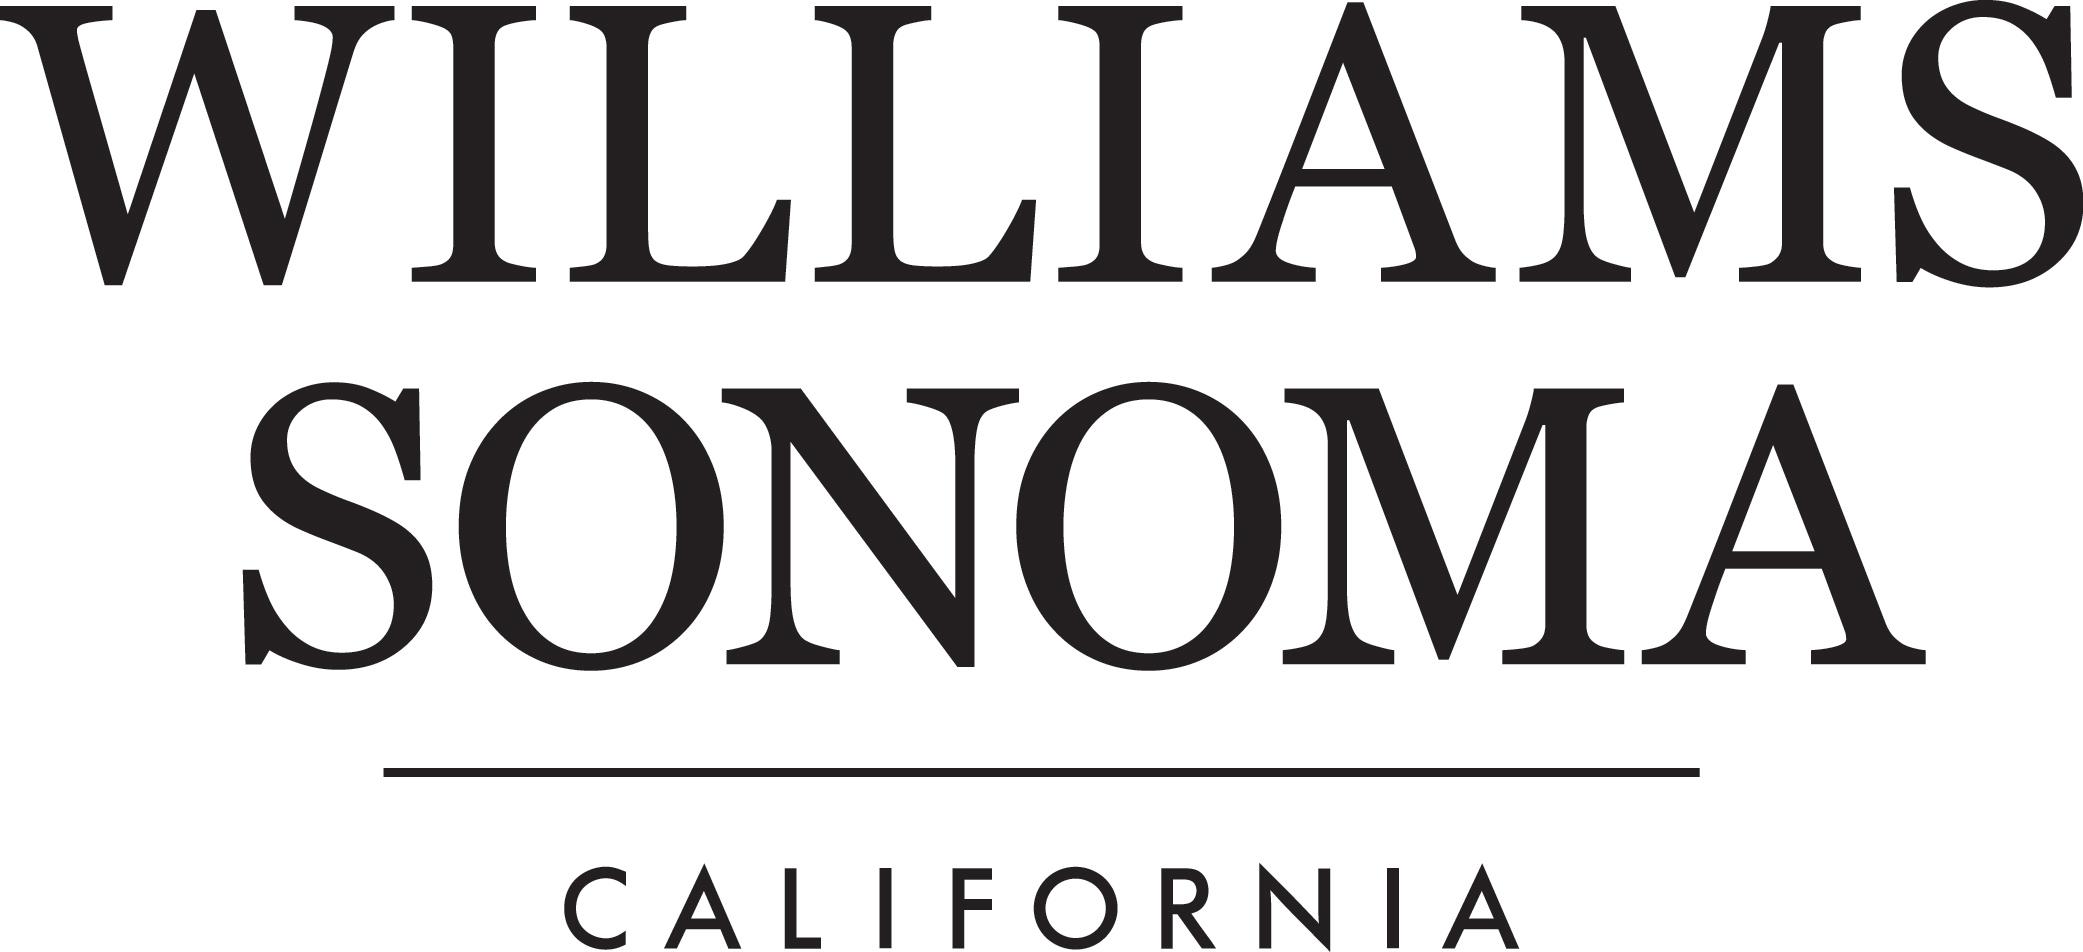 WILLIAMS SONOMA LAUNCHES FIRST HOME DECOR COLLABORATION